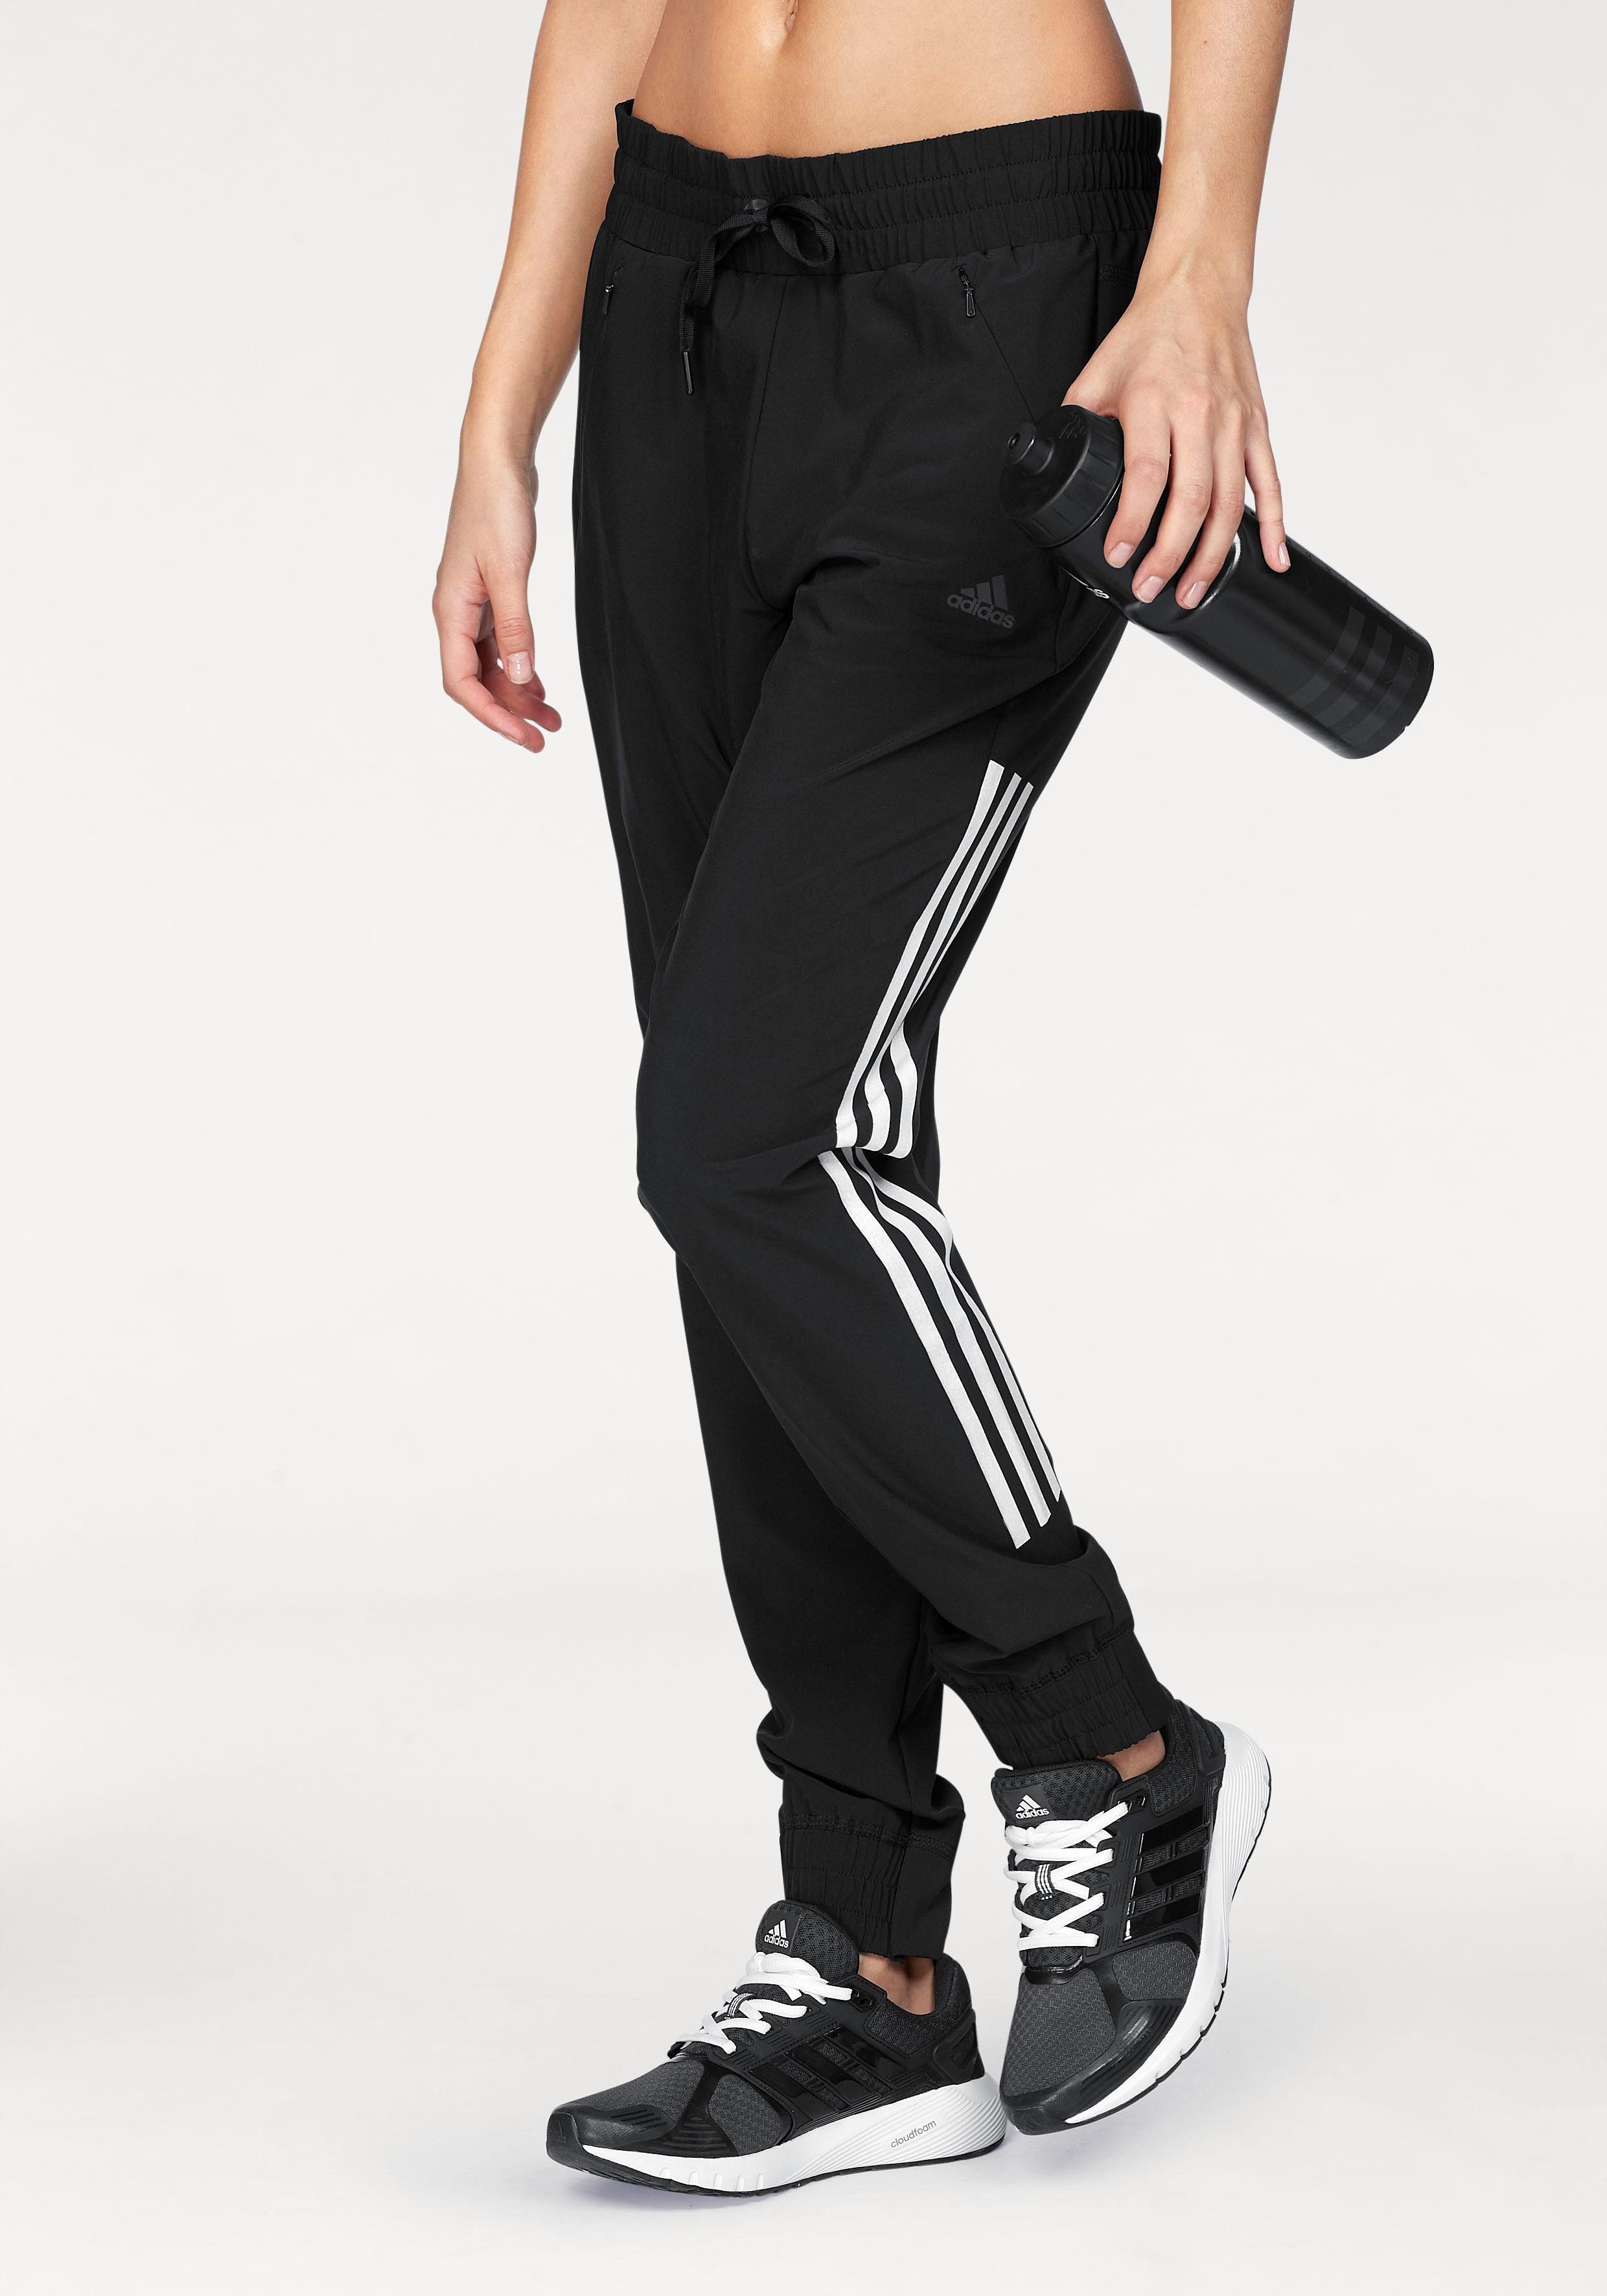 adidas Performance Woven Trainingshose Damen schwarz